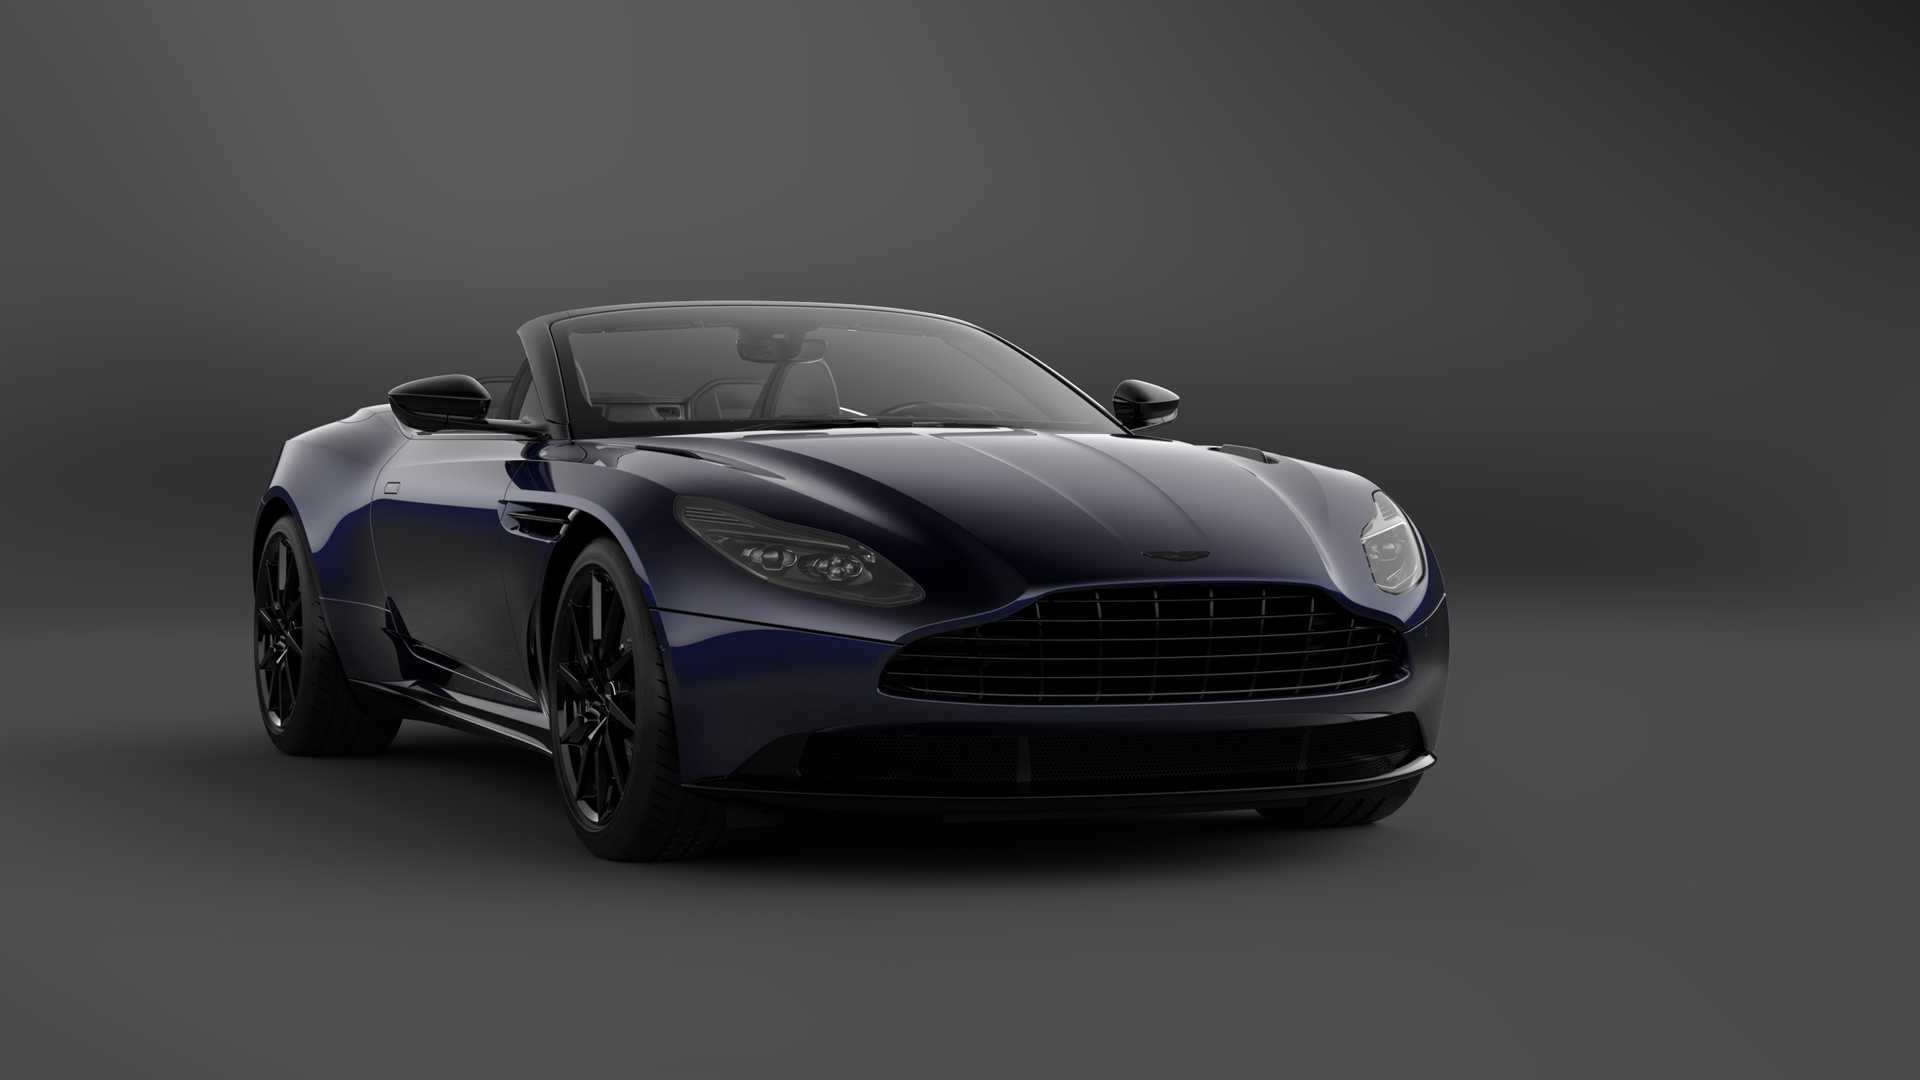 Aston-Martin-DB11-V8-Shadow-Edition-9